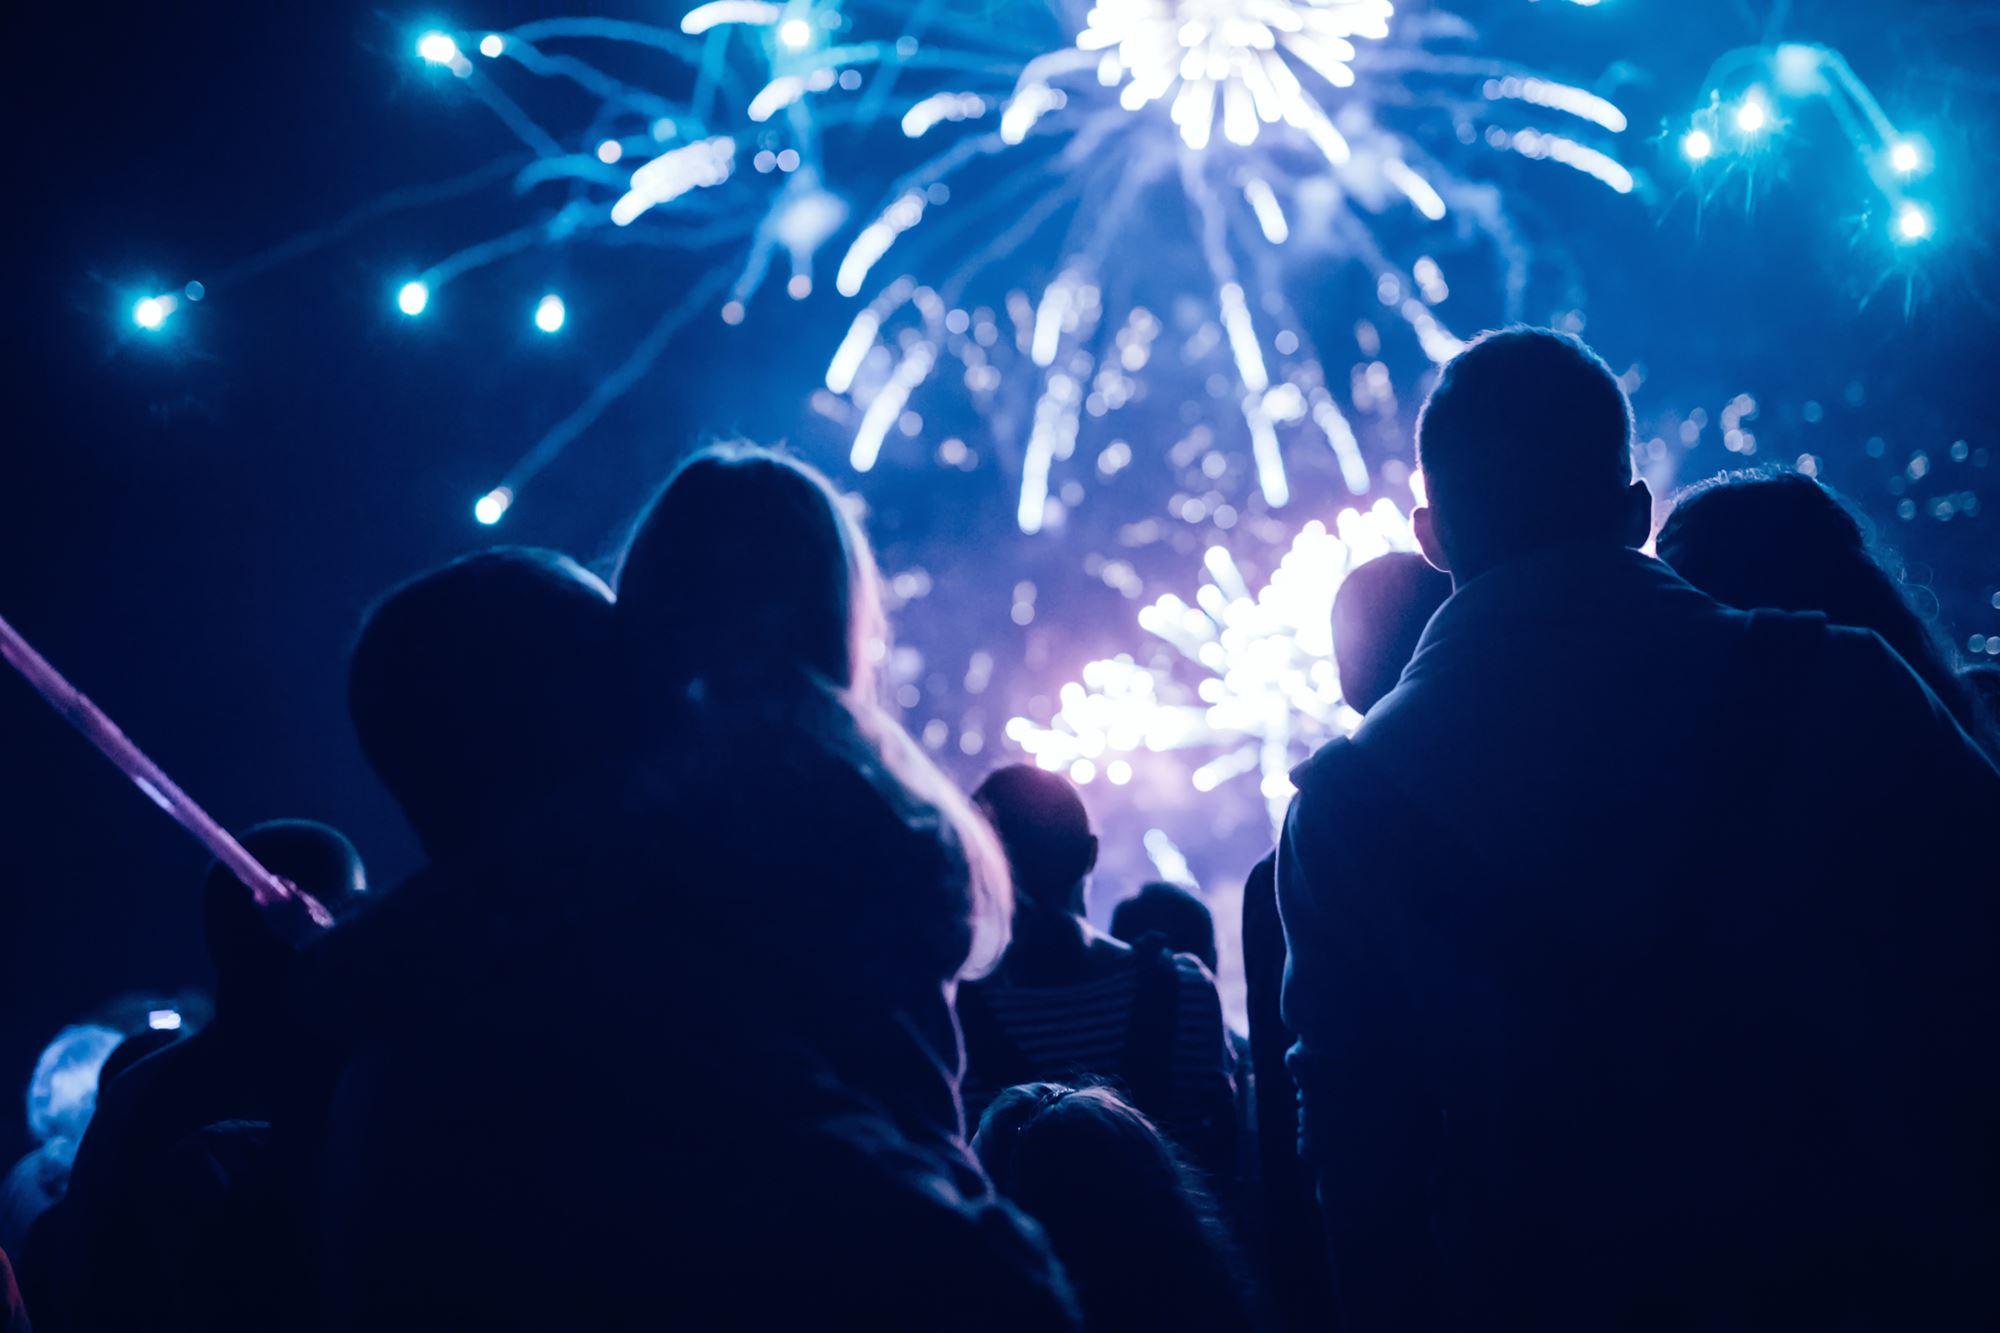 Onlookers watching fireworks